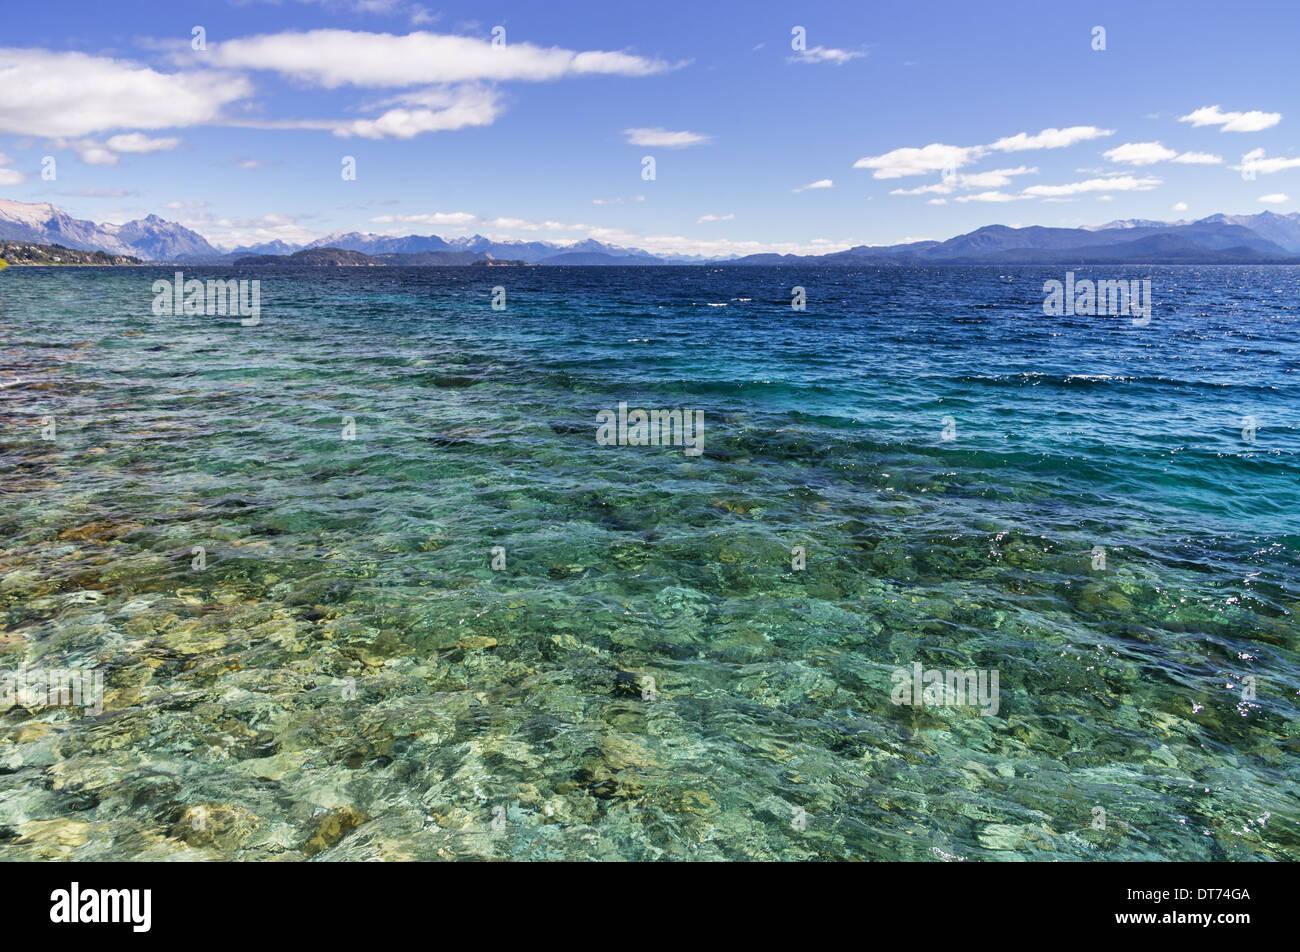 Lake Nahuel Huapi from San Carlos De Bariloche Argentina - Stock Image